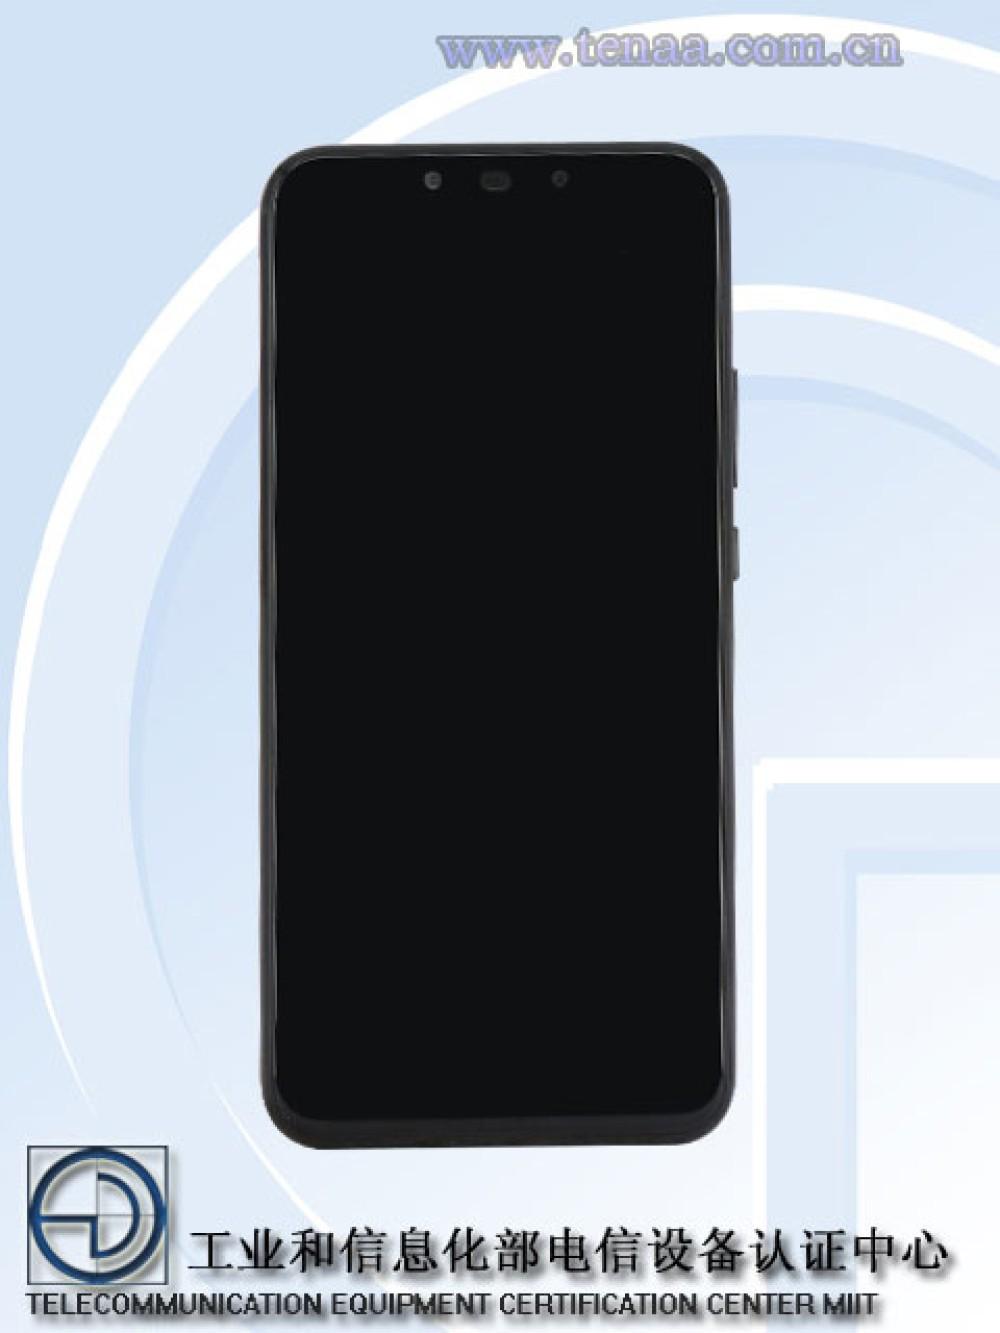 Huawei Mate 20 Lite: Διέρρευσε ο σχεδιασμός στο TENAA και φήμες για οθόνη 19:9 και Kirin 710 SoC